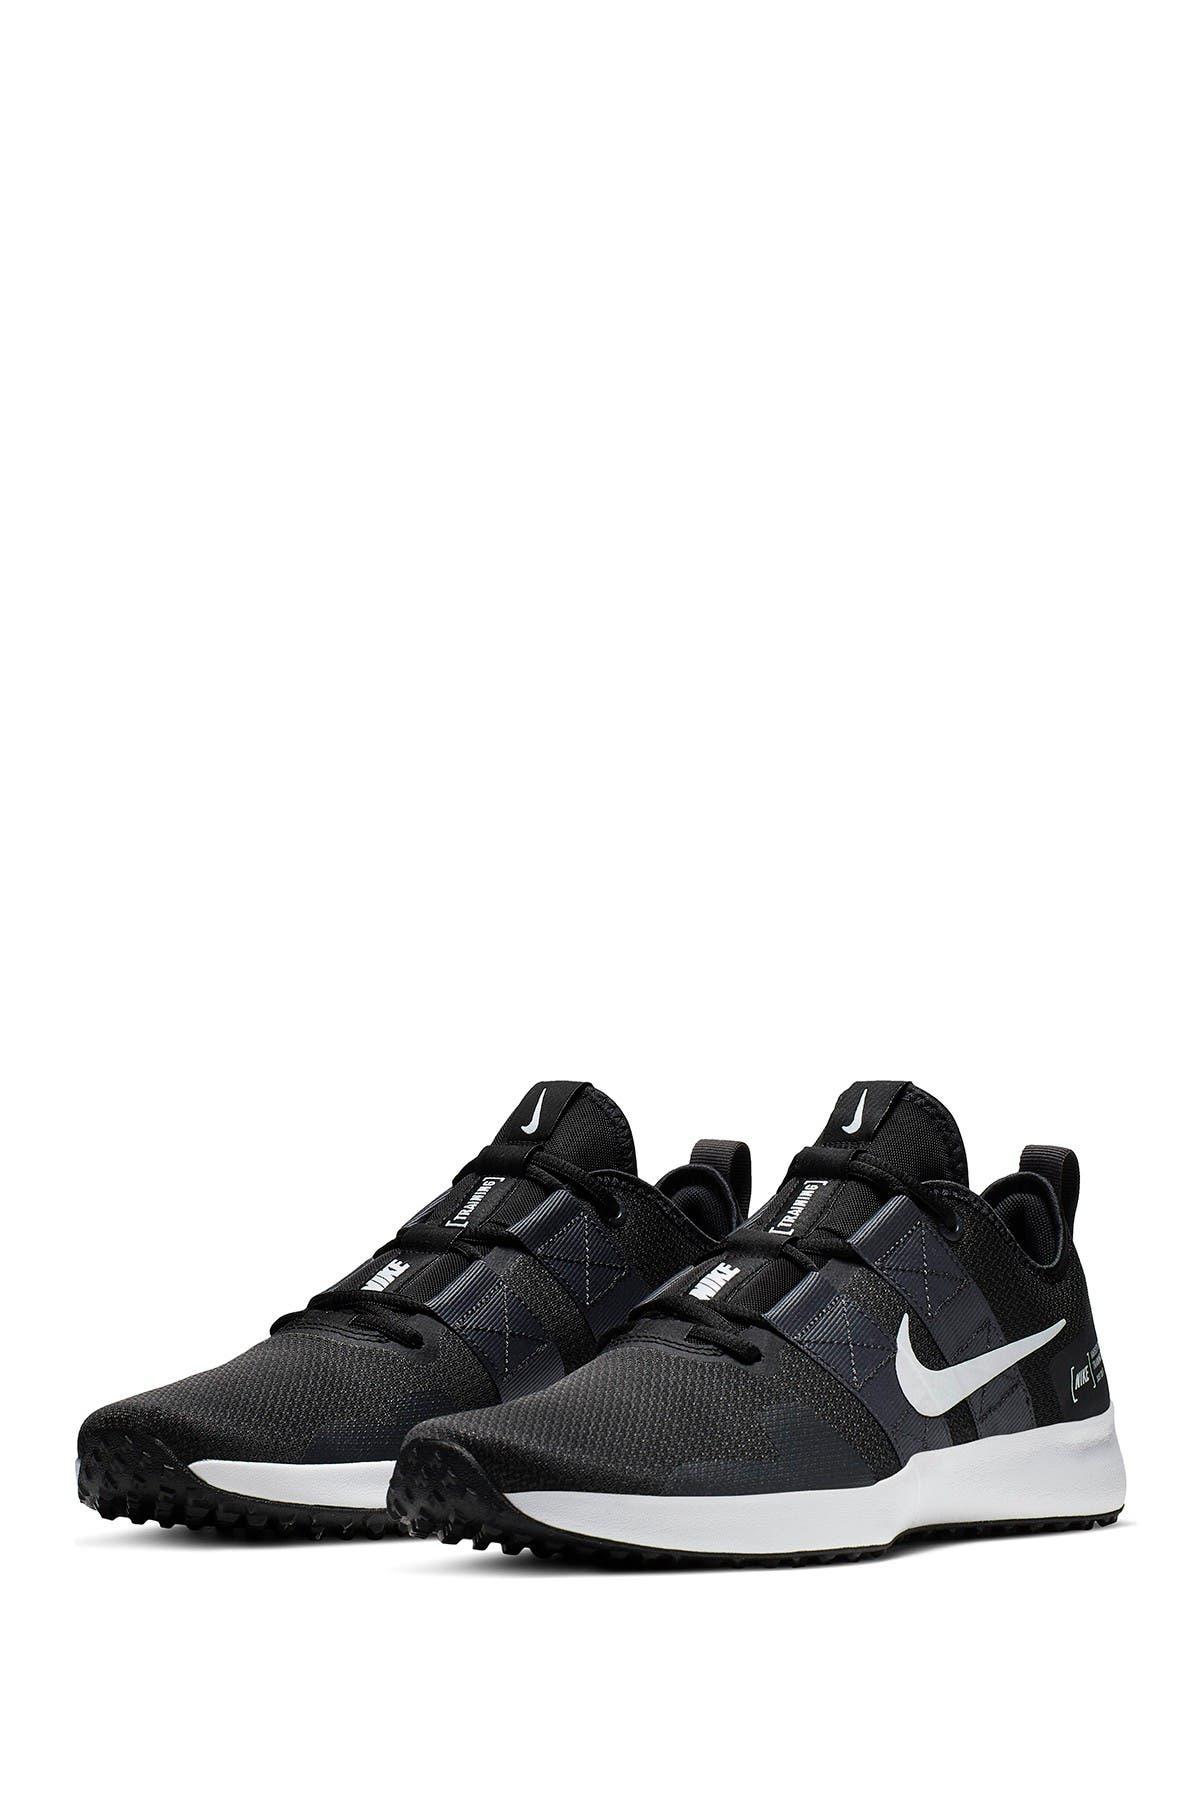 Nike | Varsity Compete 2 Trainer